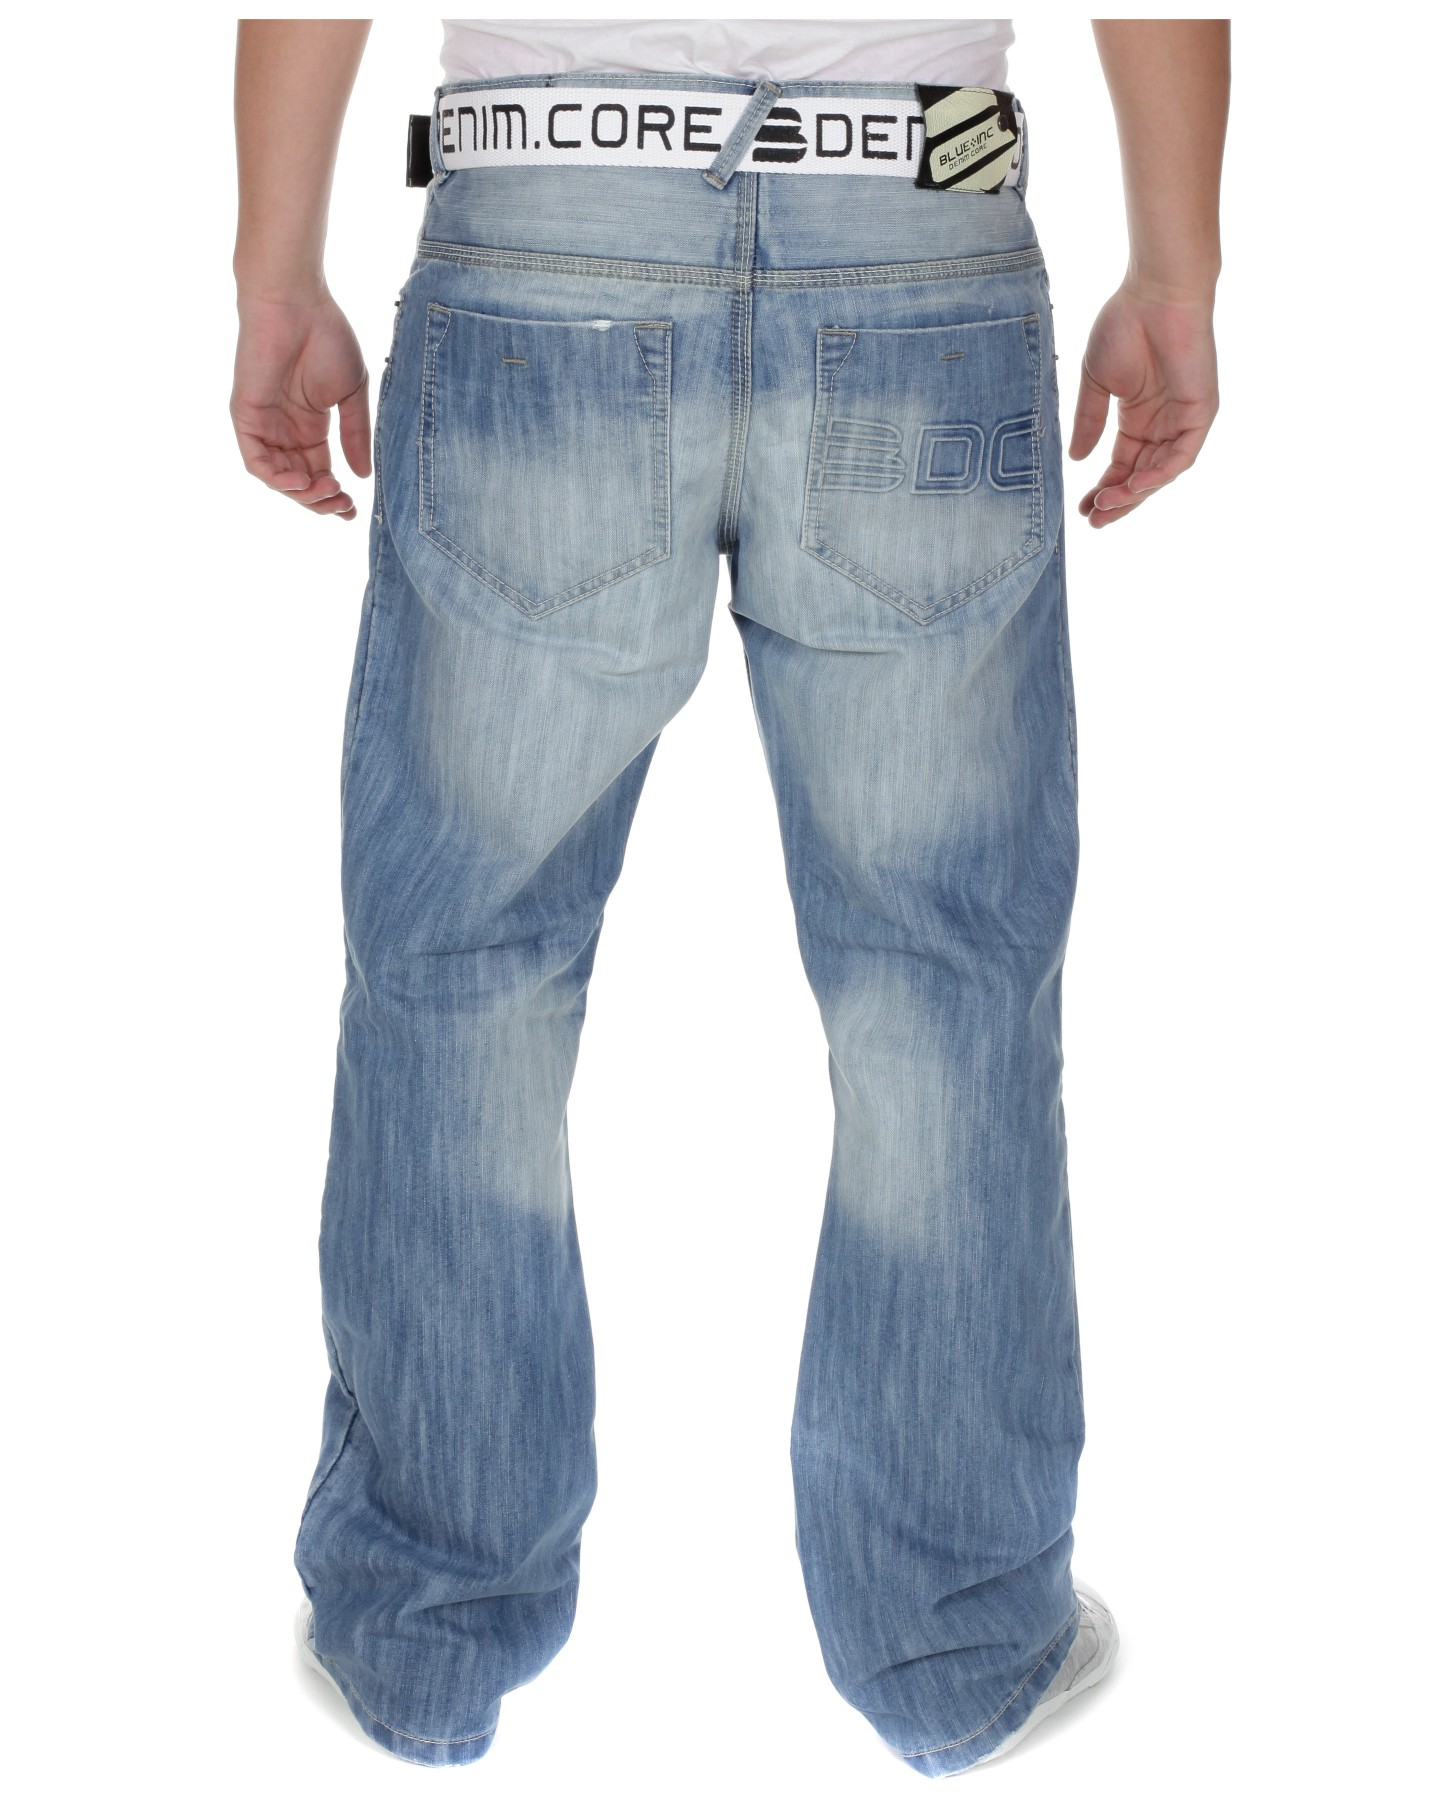 Blue Inc Mens DNM Core Bootcut Jeans Light Blue | eBay